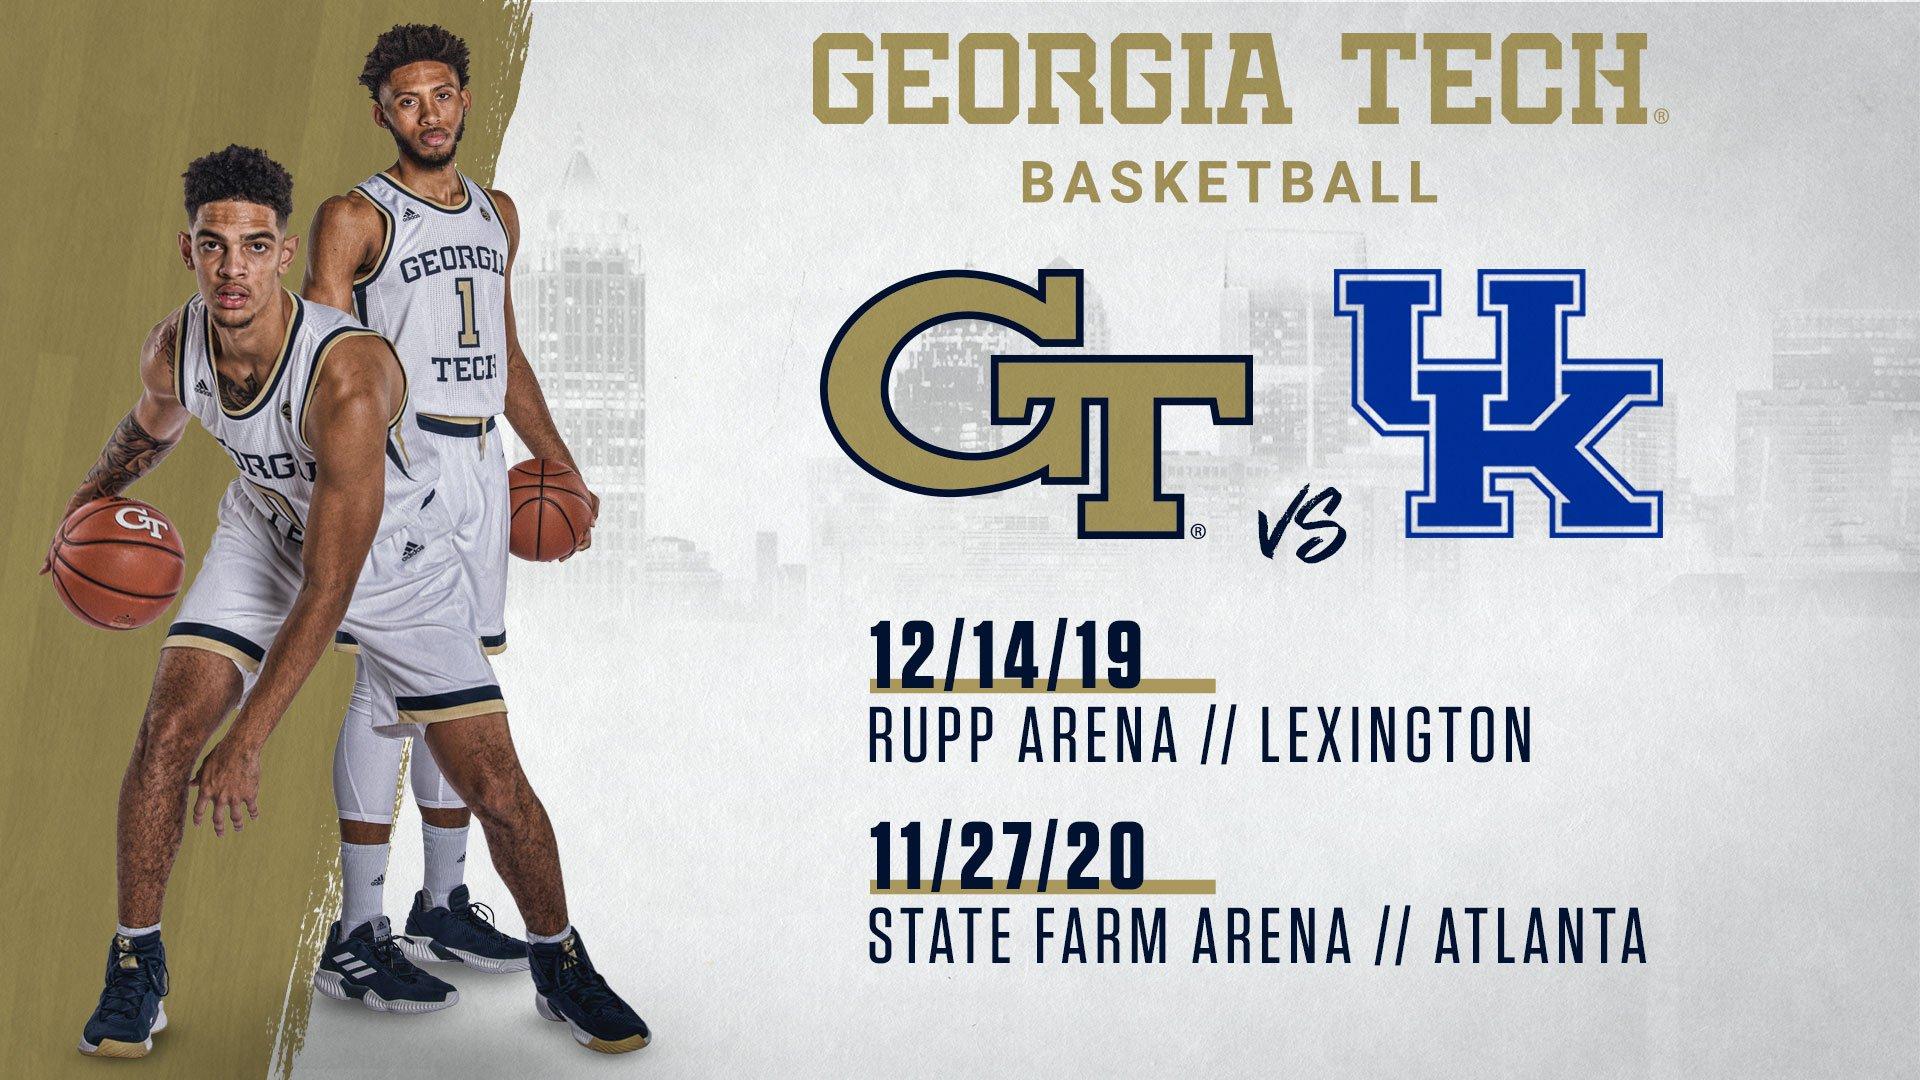 Georgia Tech Yellow Jackets NCAA Basketball: SCHEDULE NEWS! #GTMBB & Kentucky Agree on 2-game series. Jackets travel to Lexington th...